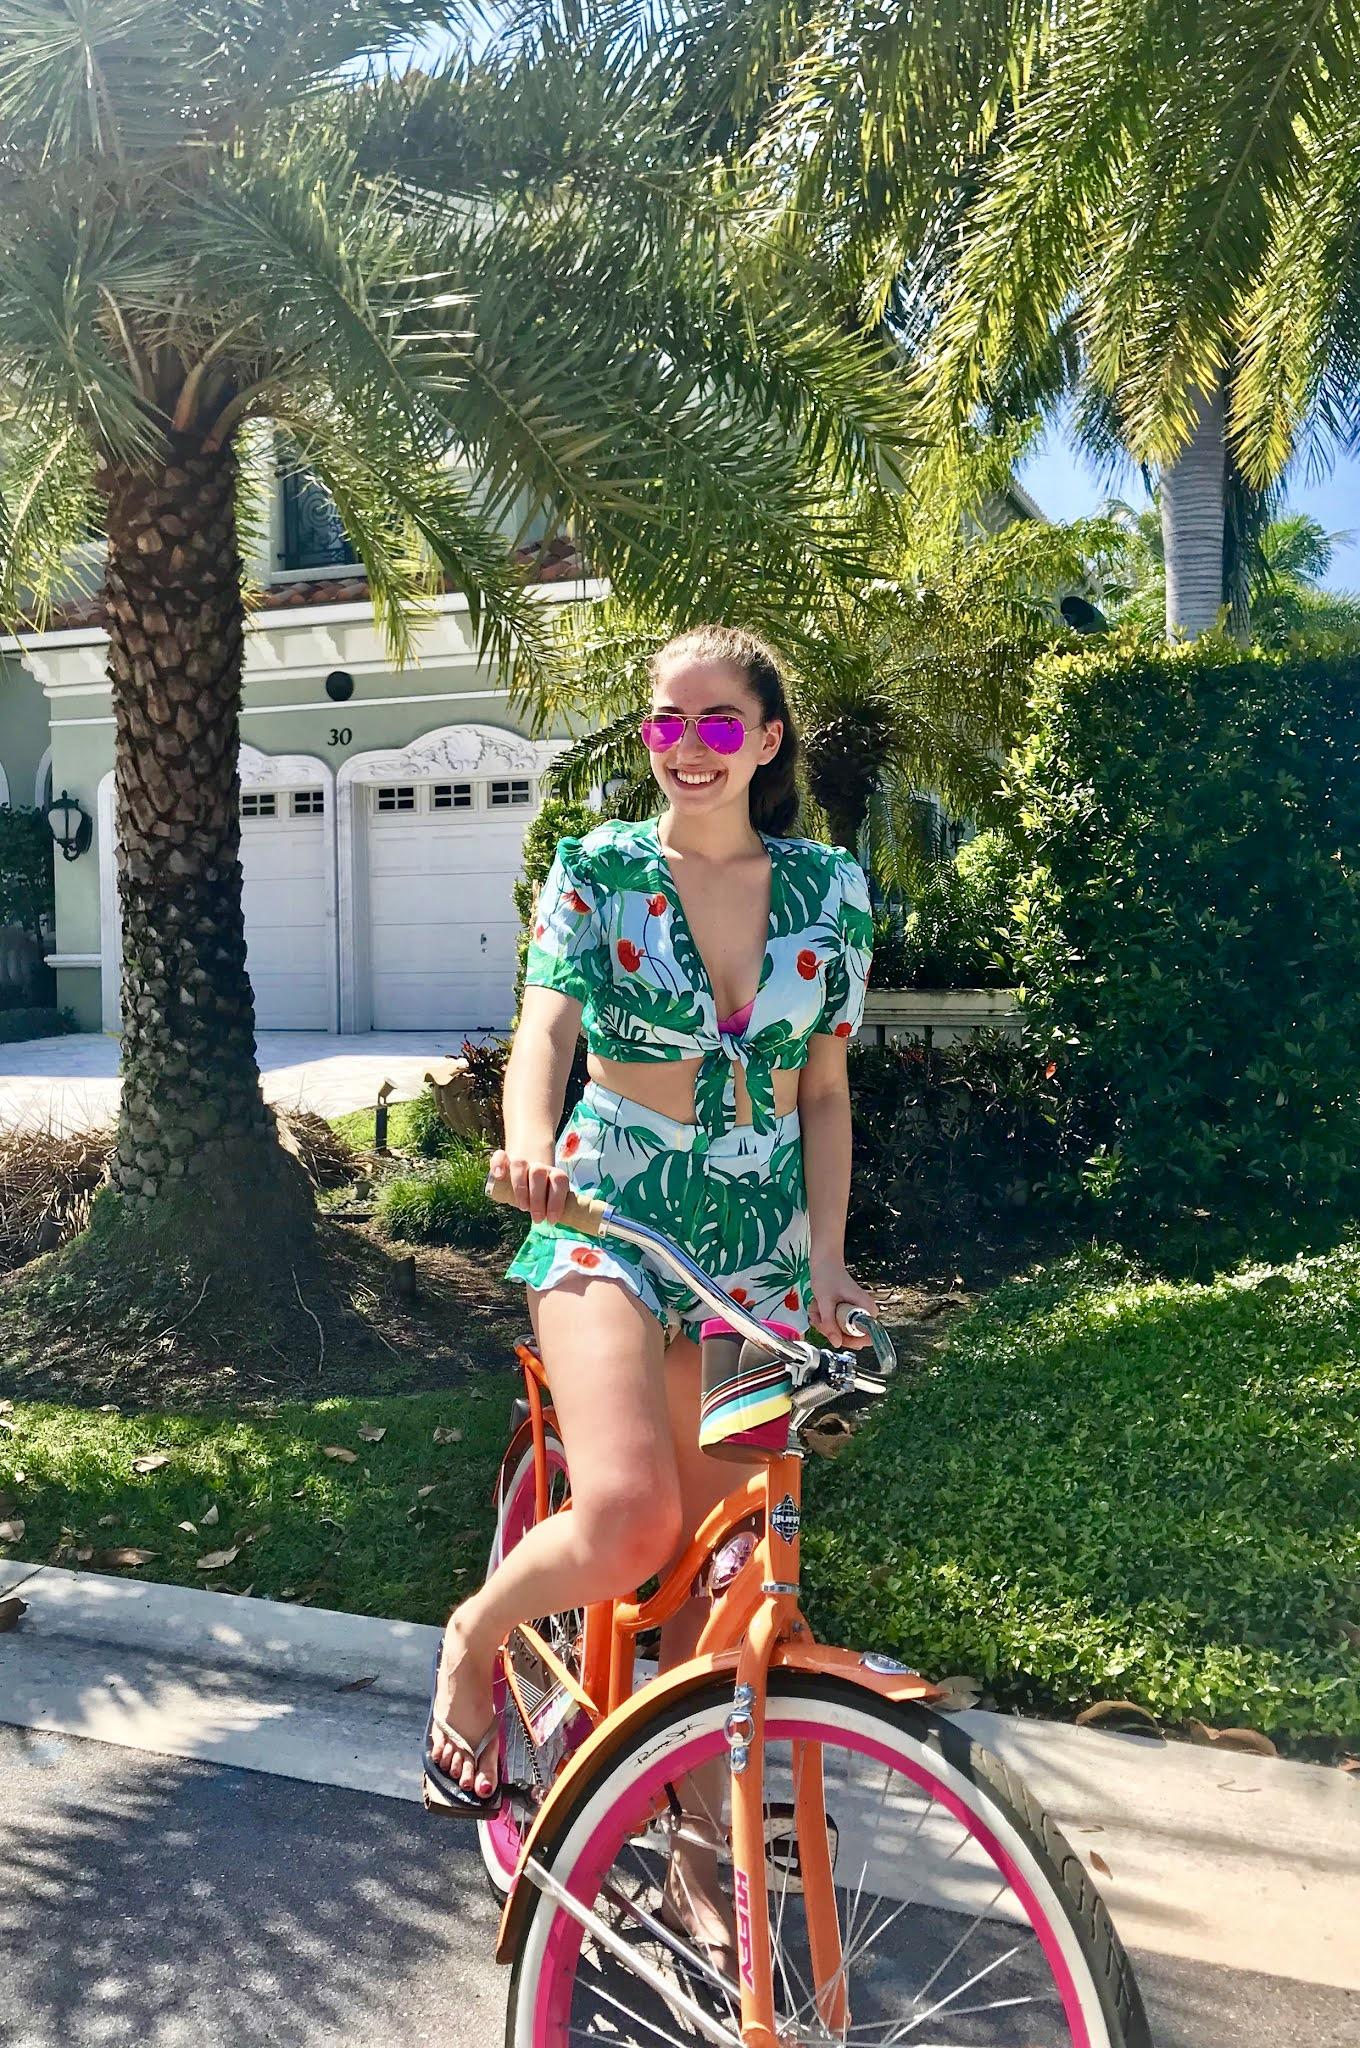 two piece set, biking, bike ride, tropical set, vacation, palm tree, florida, beach vacation, vacation outfits